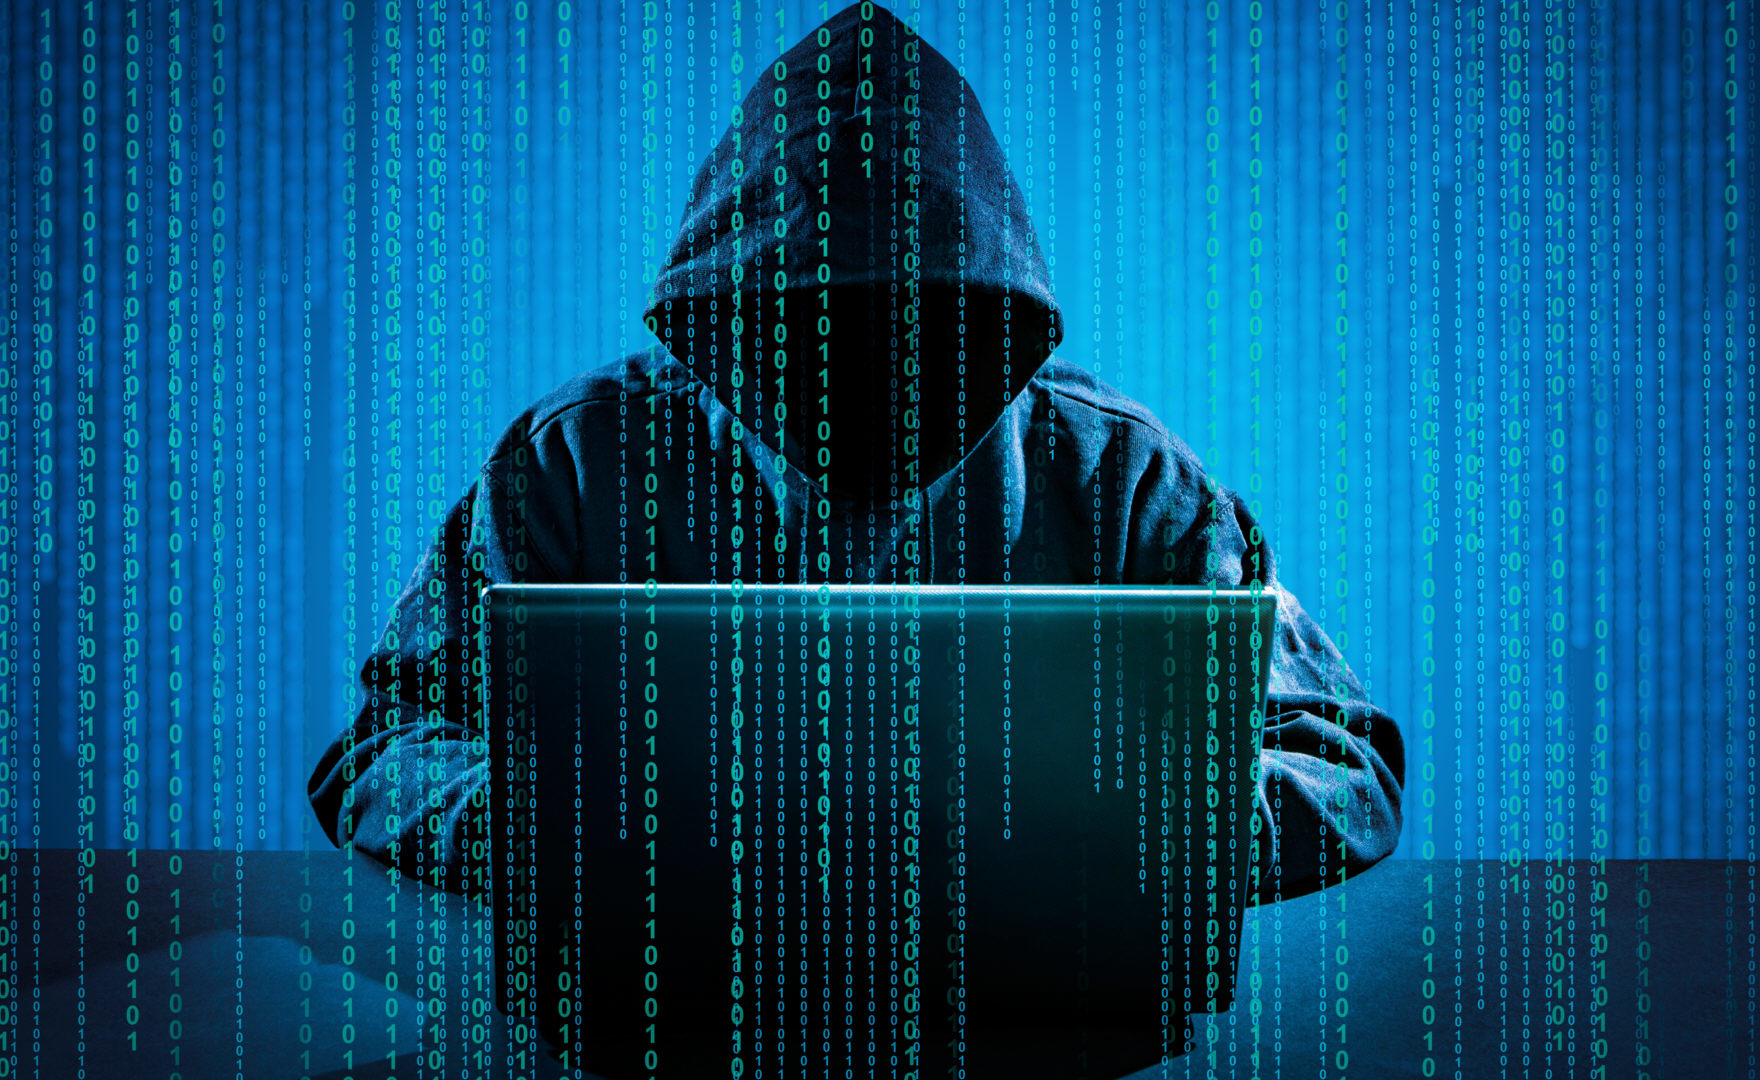 Cyber attacco in Venezuela, le spie sottraggono GB di documenti riservati